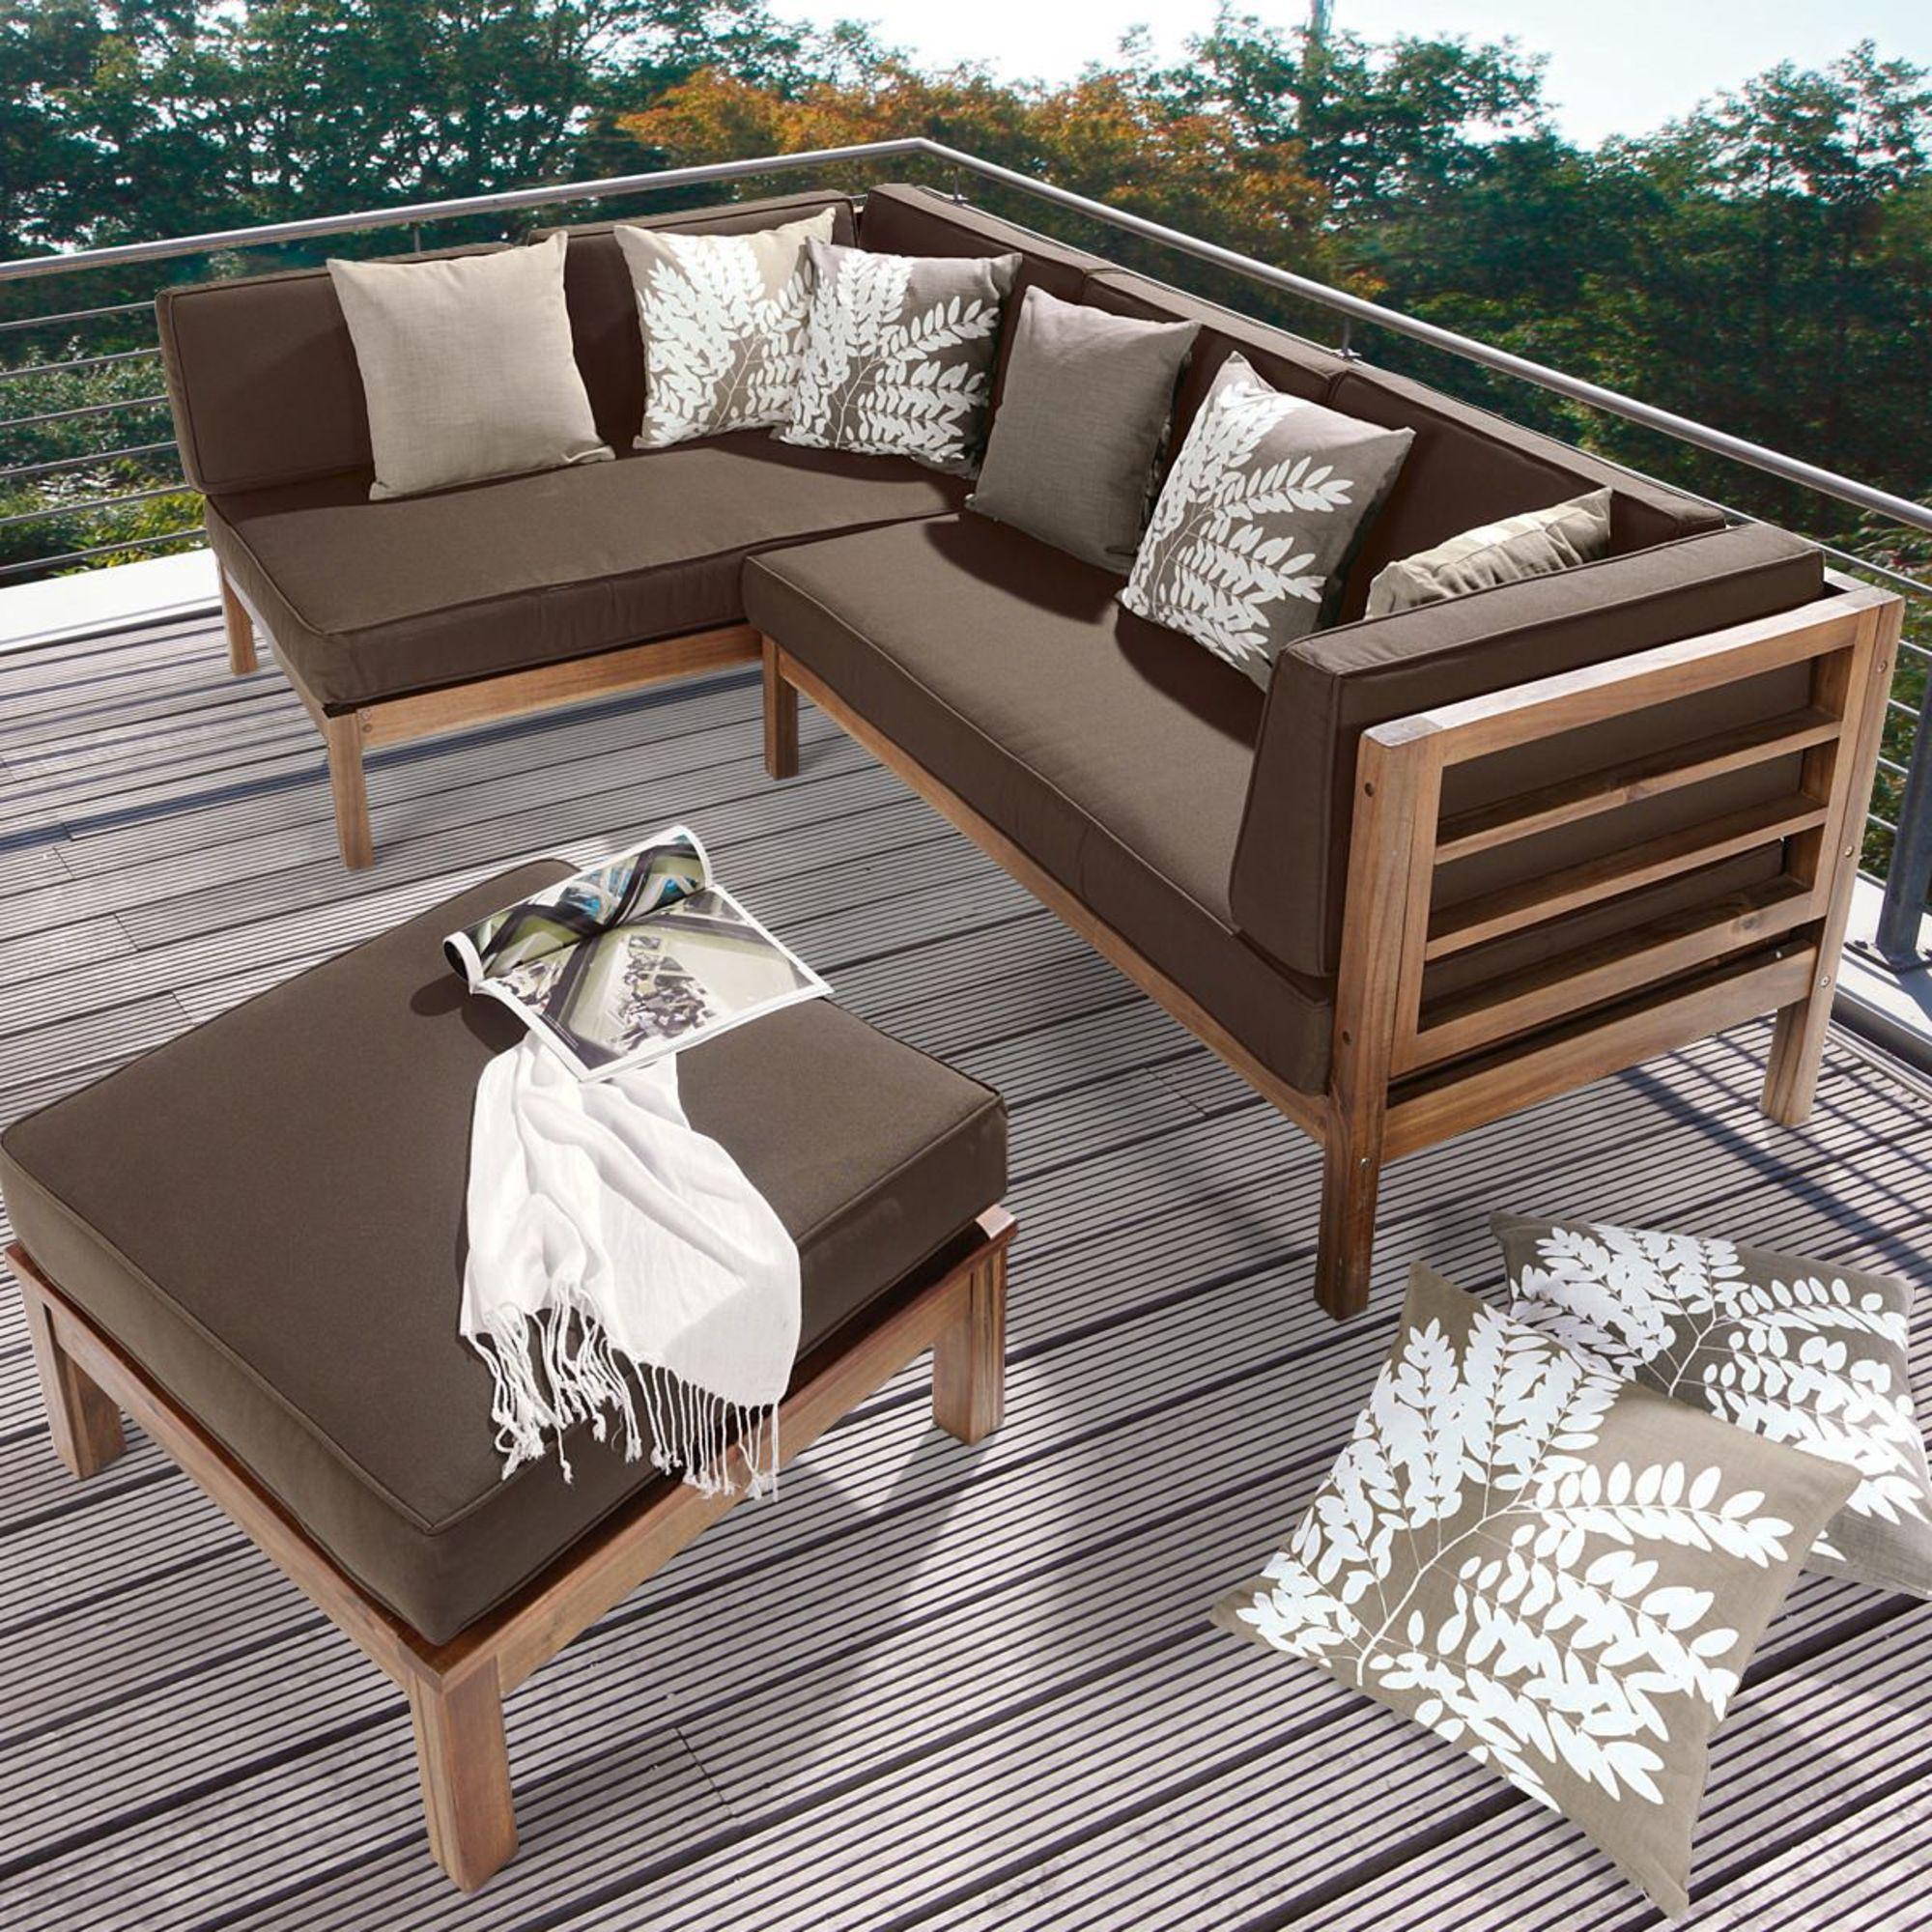 Balkonmöbel lounge holz  Holz-Ecklounge, 3-tlg. | Gartenmöbel-Sets | Gartenmöbel | Garten ...